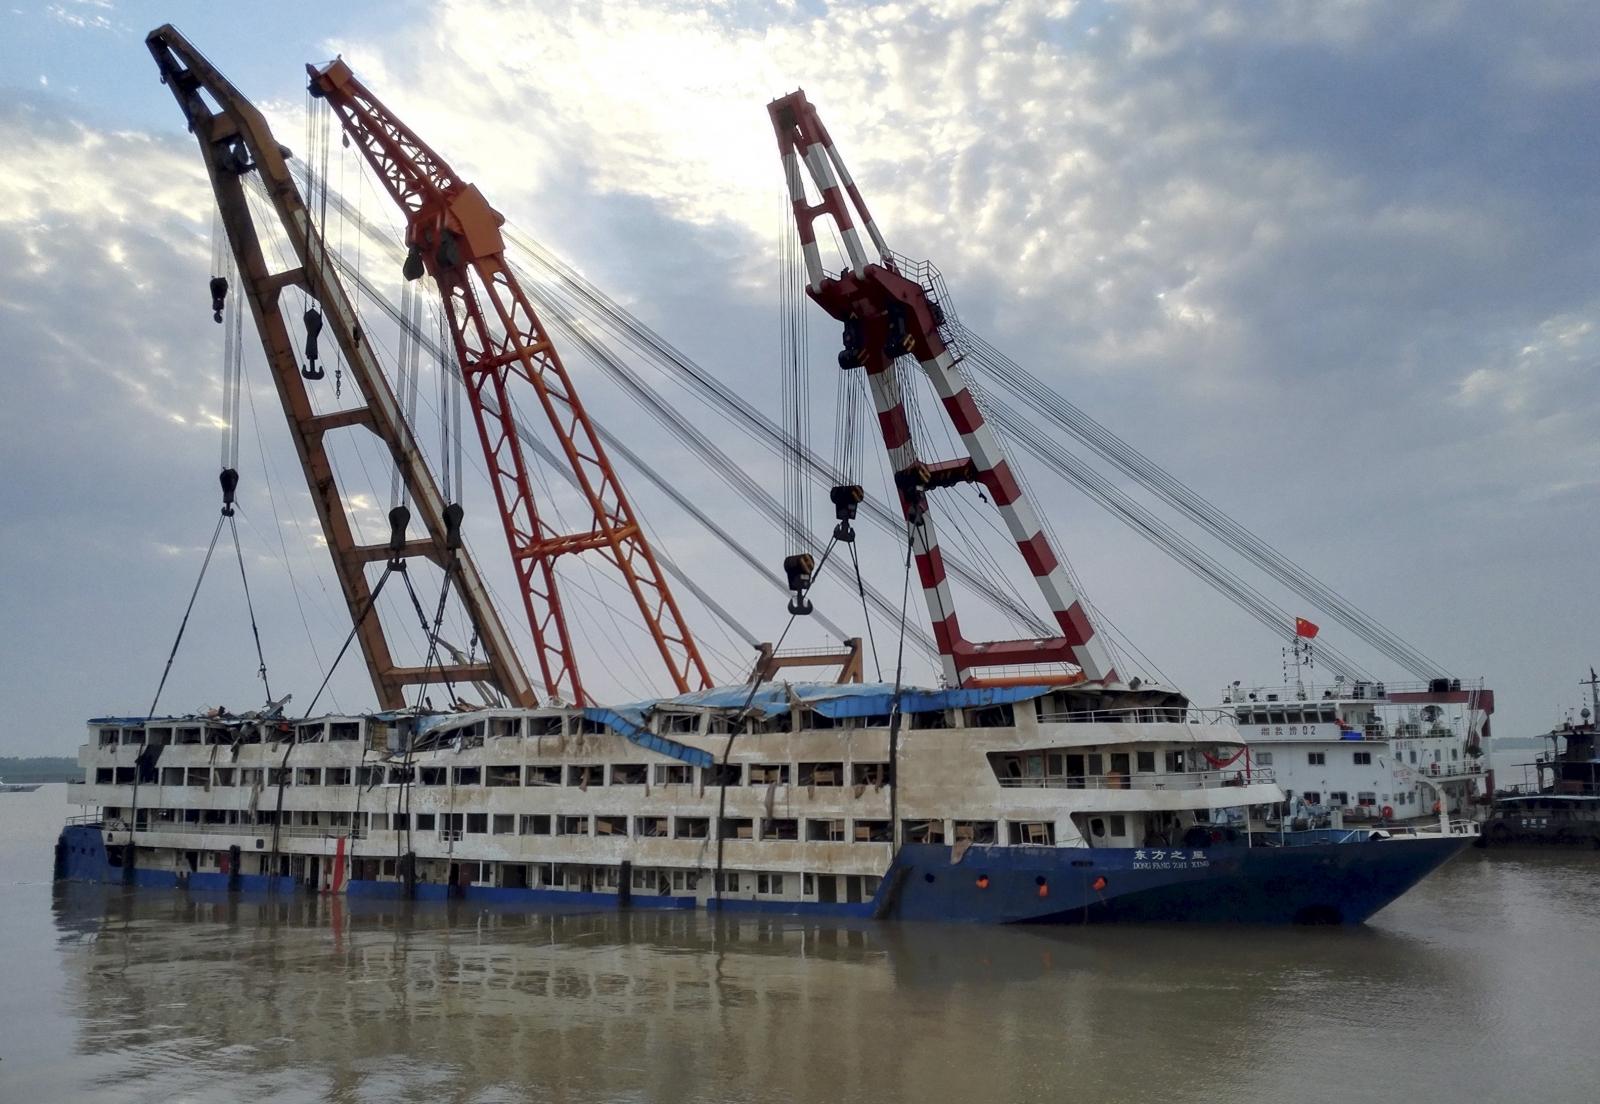 Yangtze River capsize